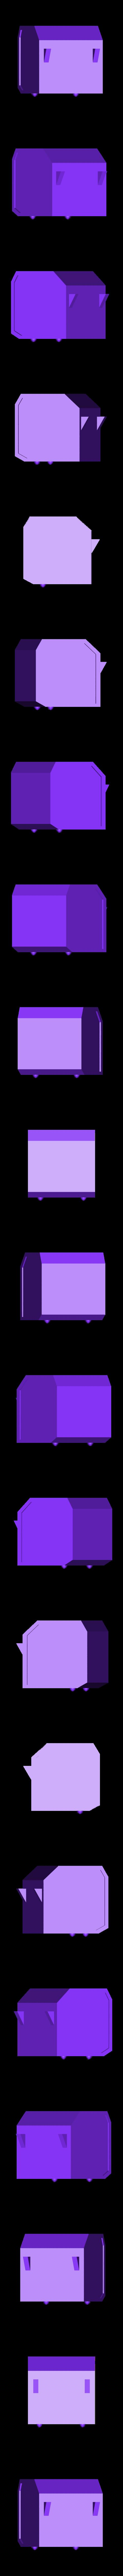 Shoulder_Rocket_Empty.stl Download free STL file Ball Joint Mad Cat Mech • 3D printable object, mrhers2